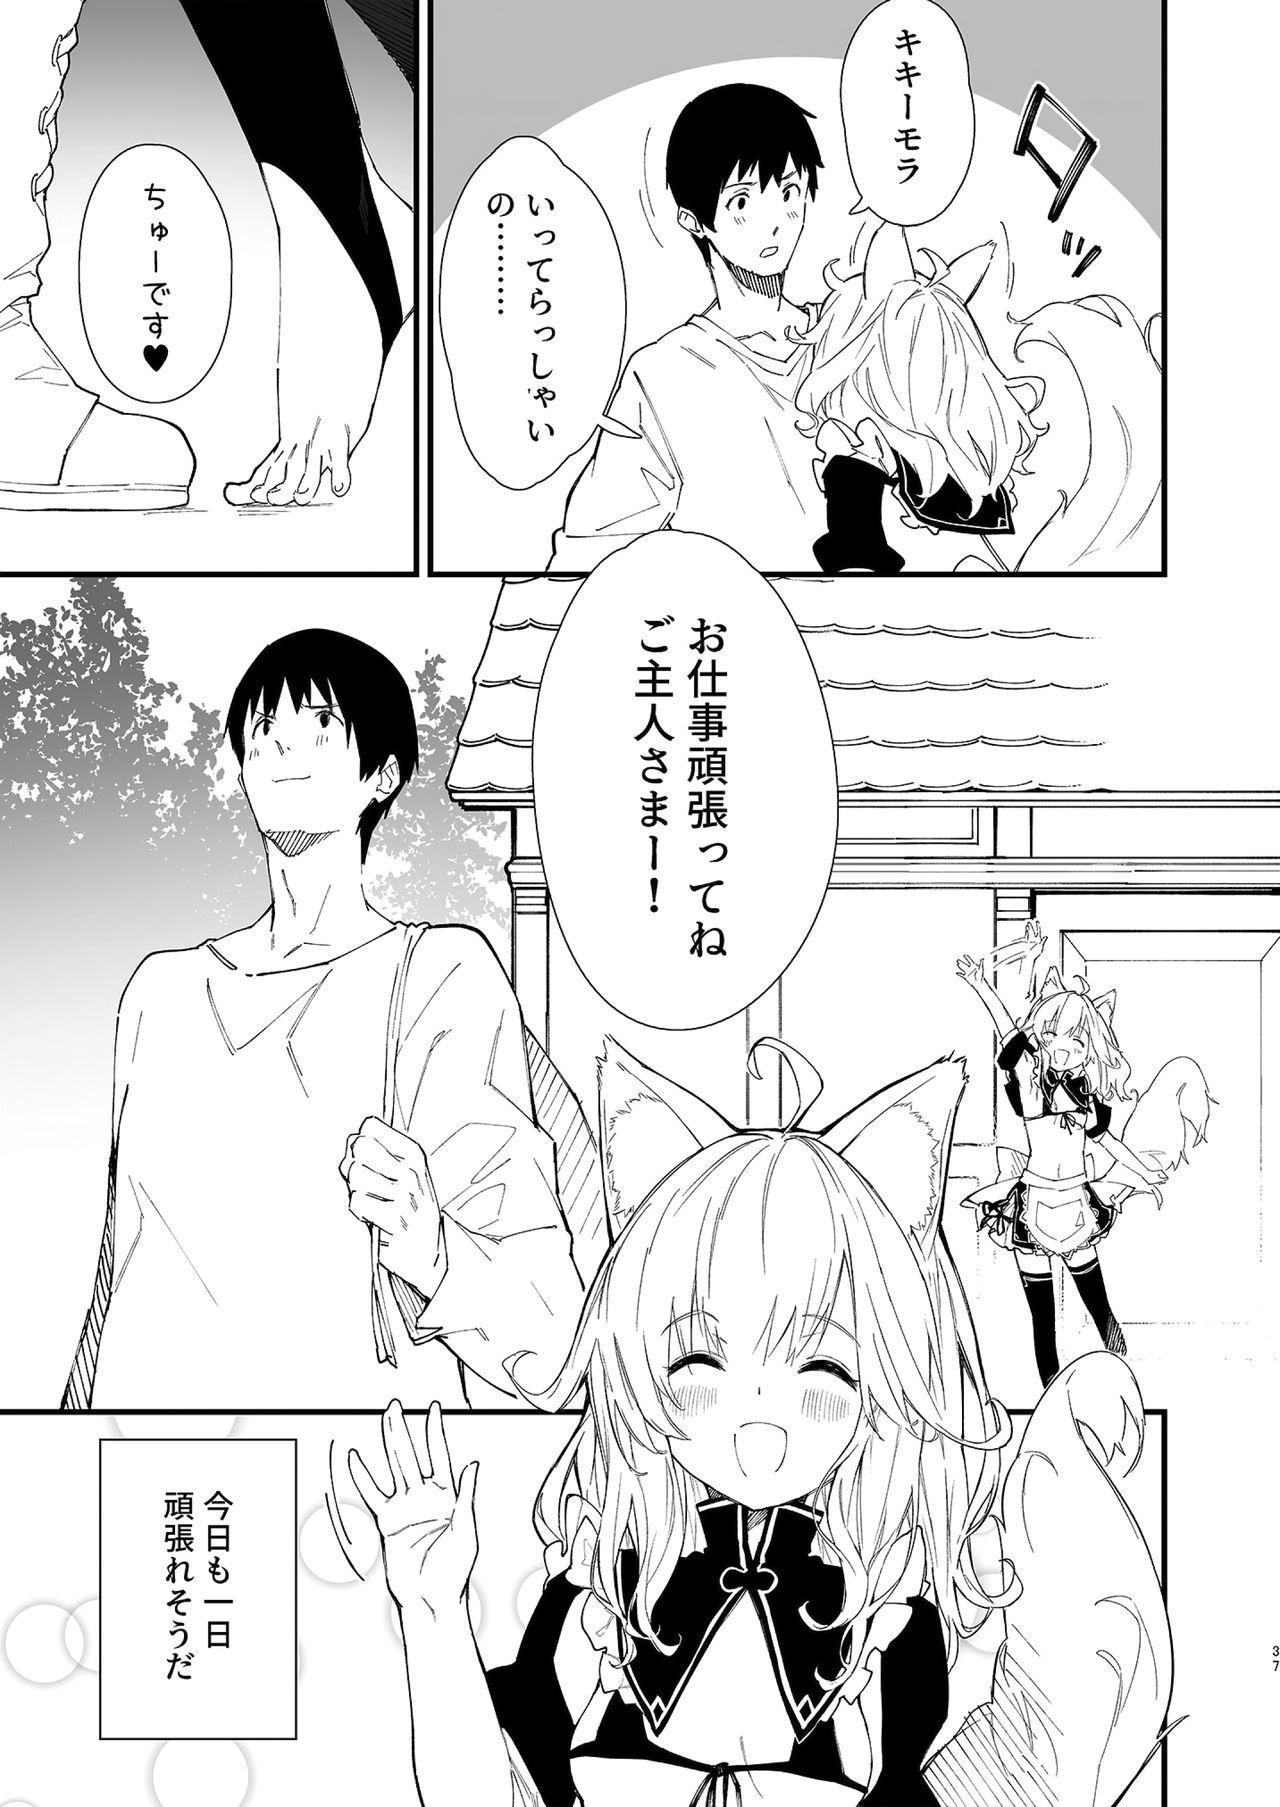 Kemomimi Maid to Ichaicha suru Hon 34